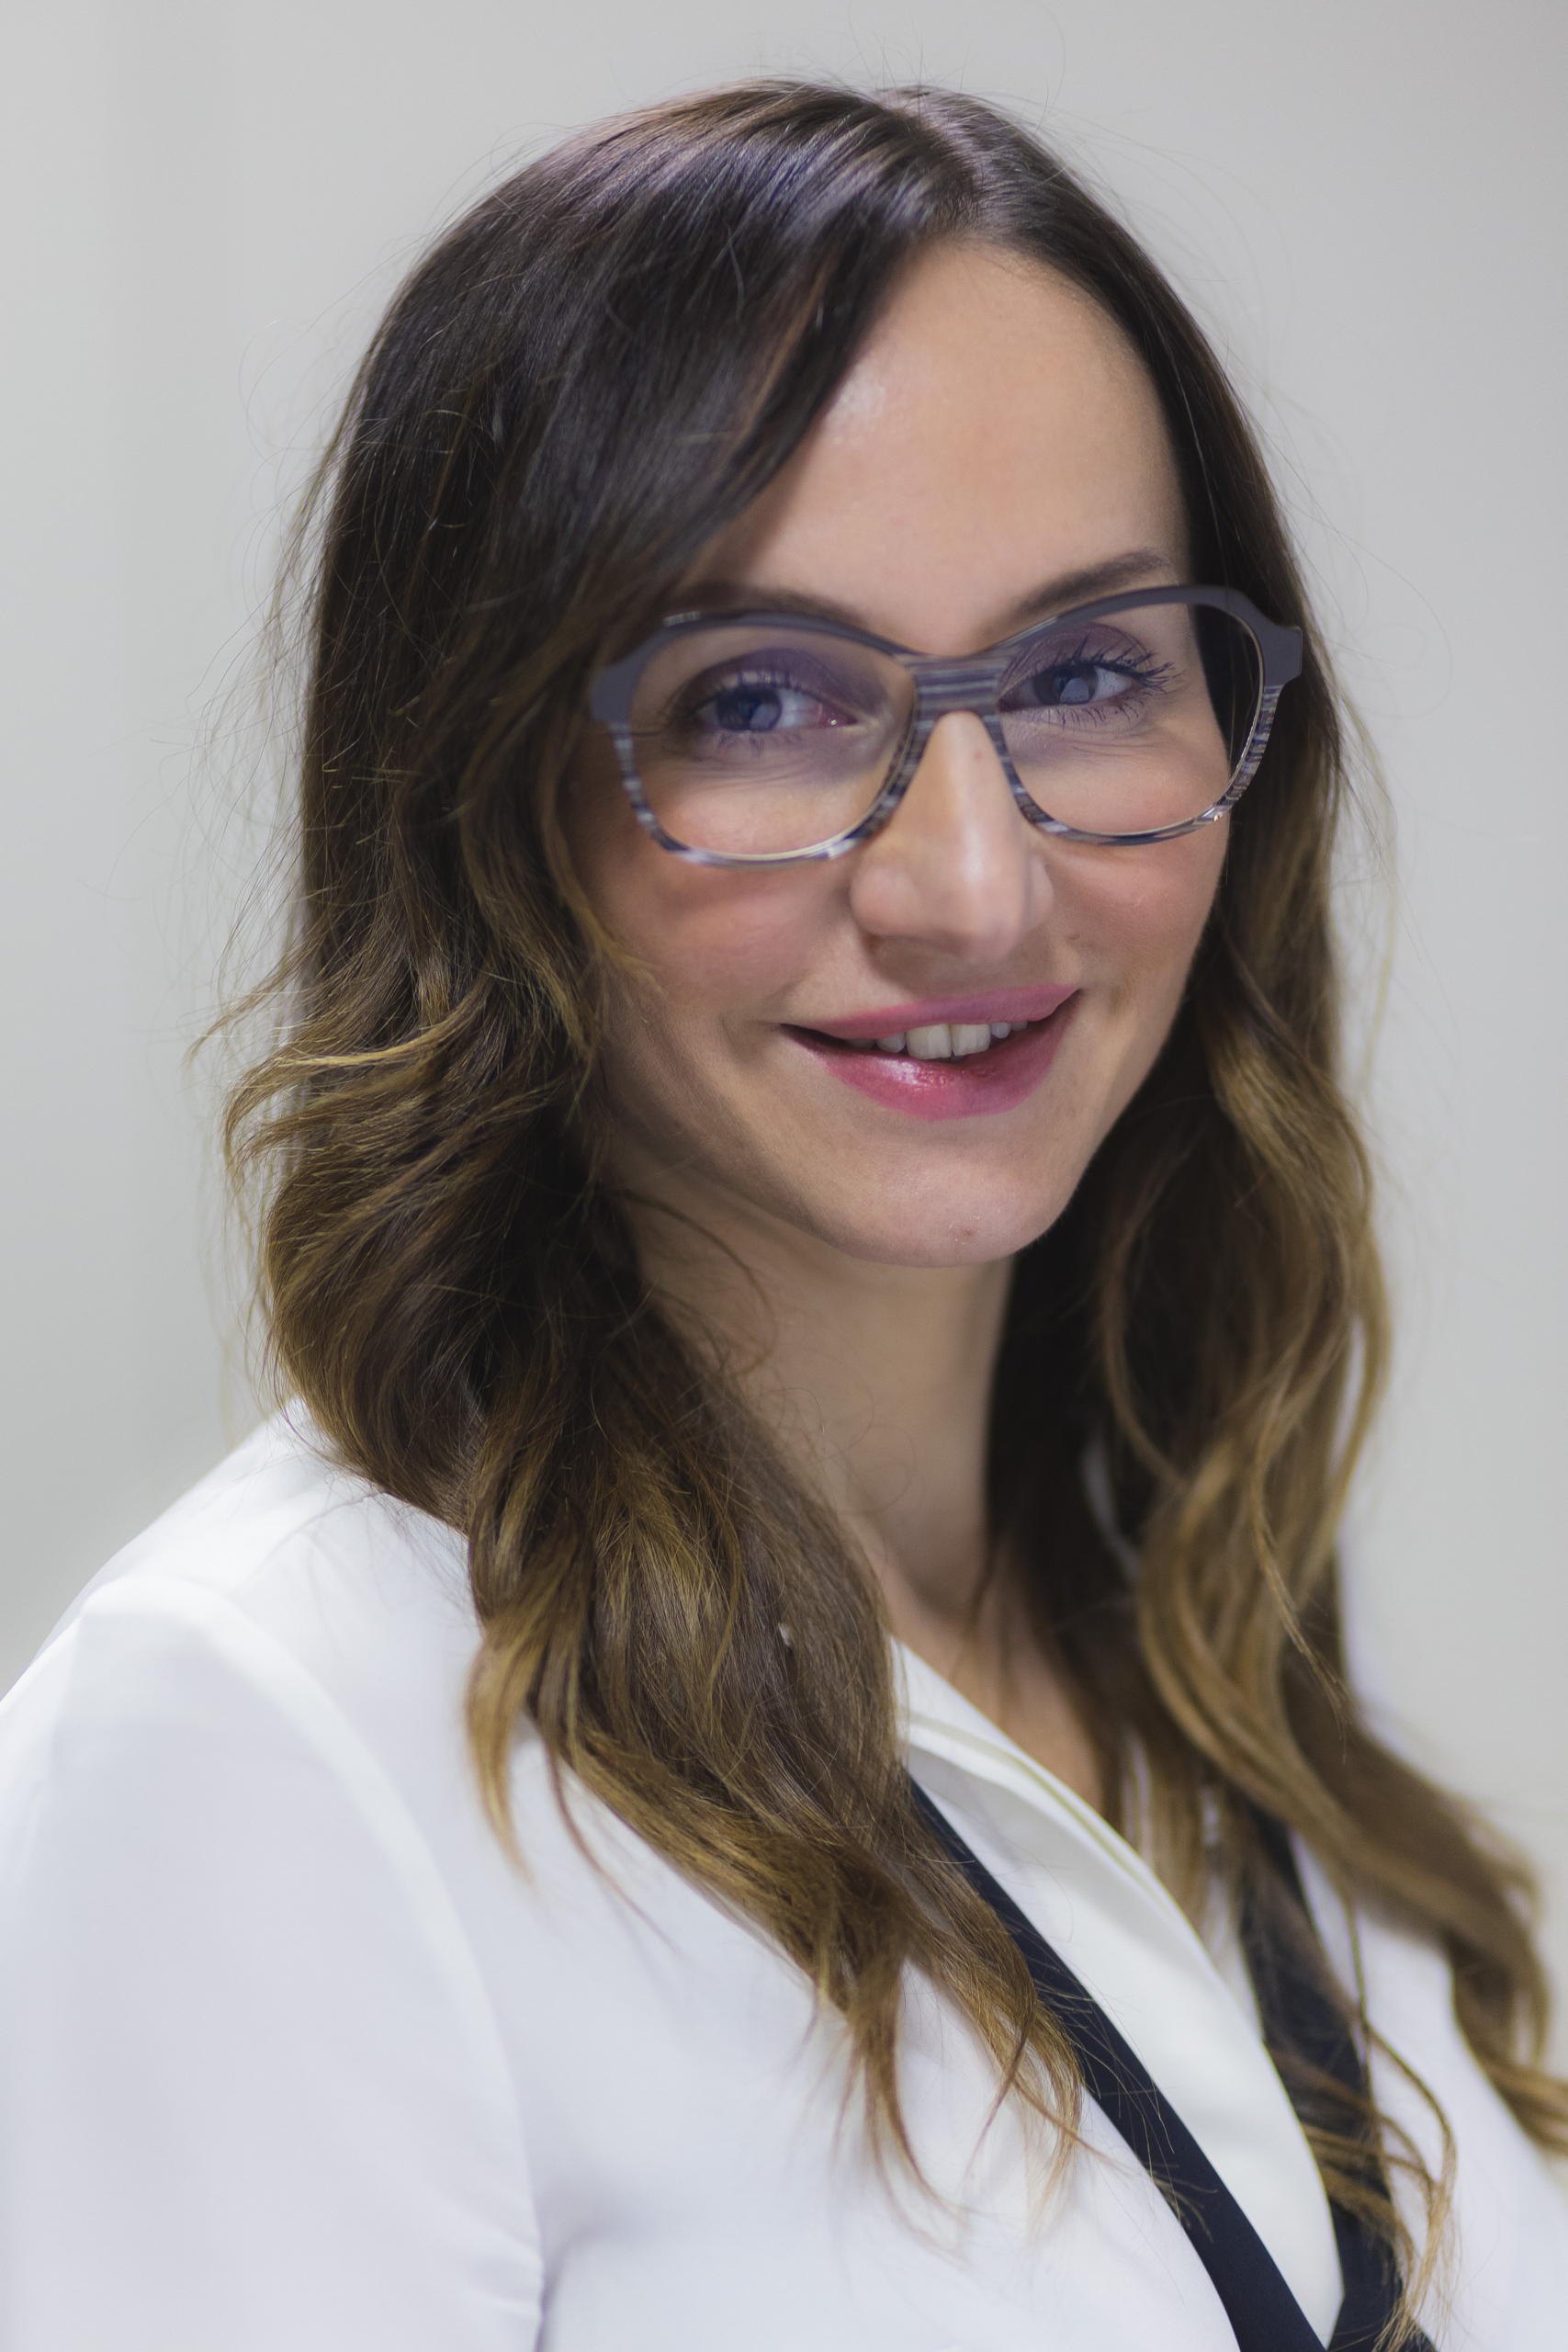 Delia Caraci